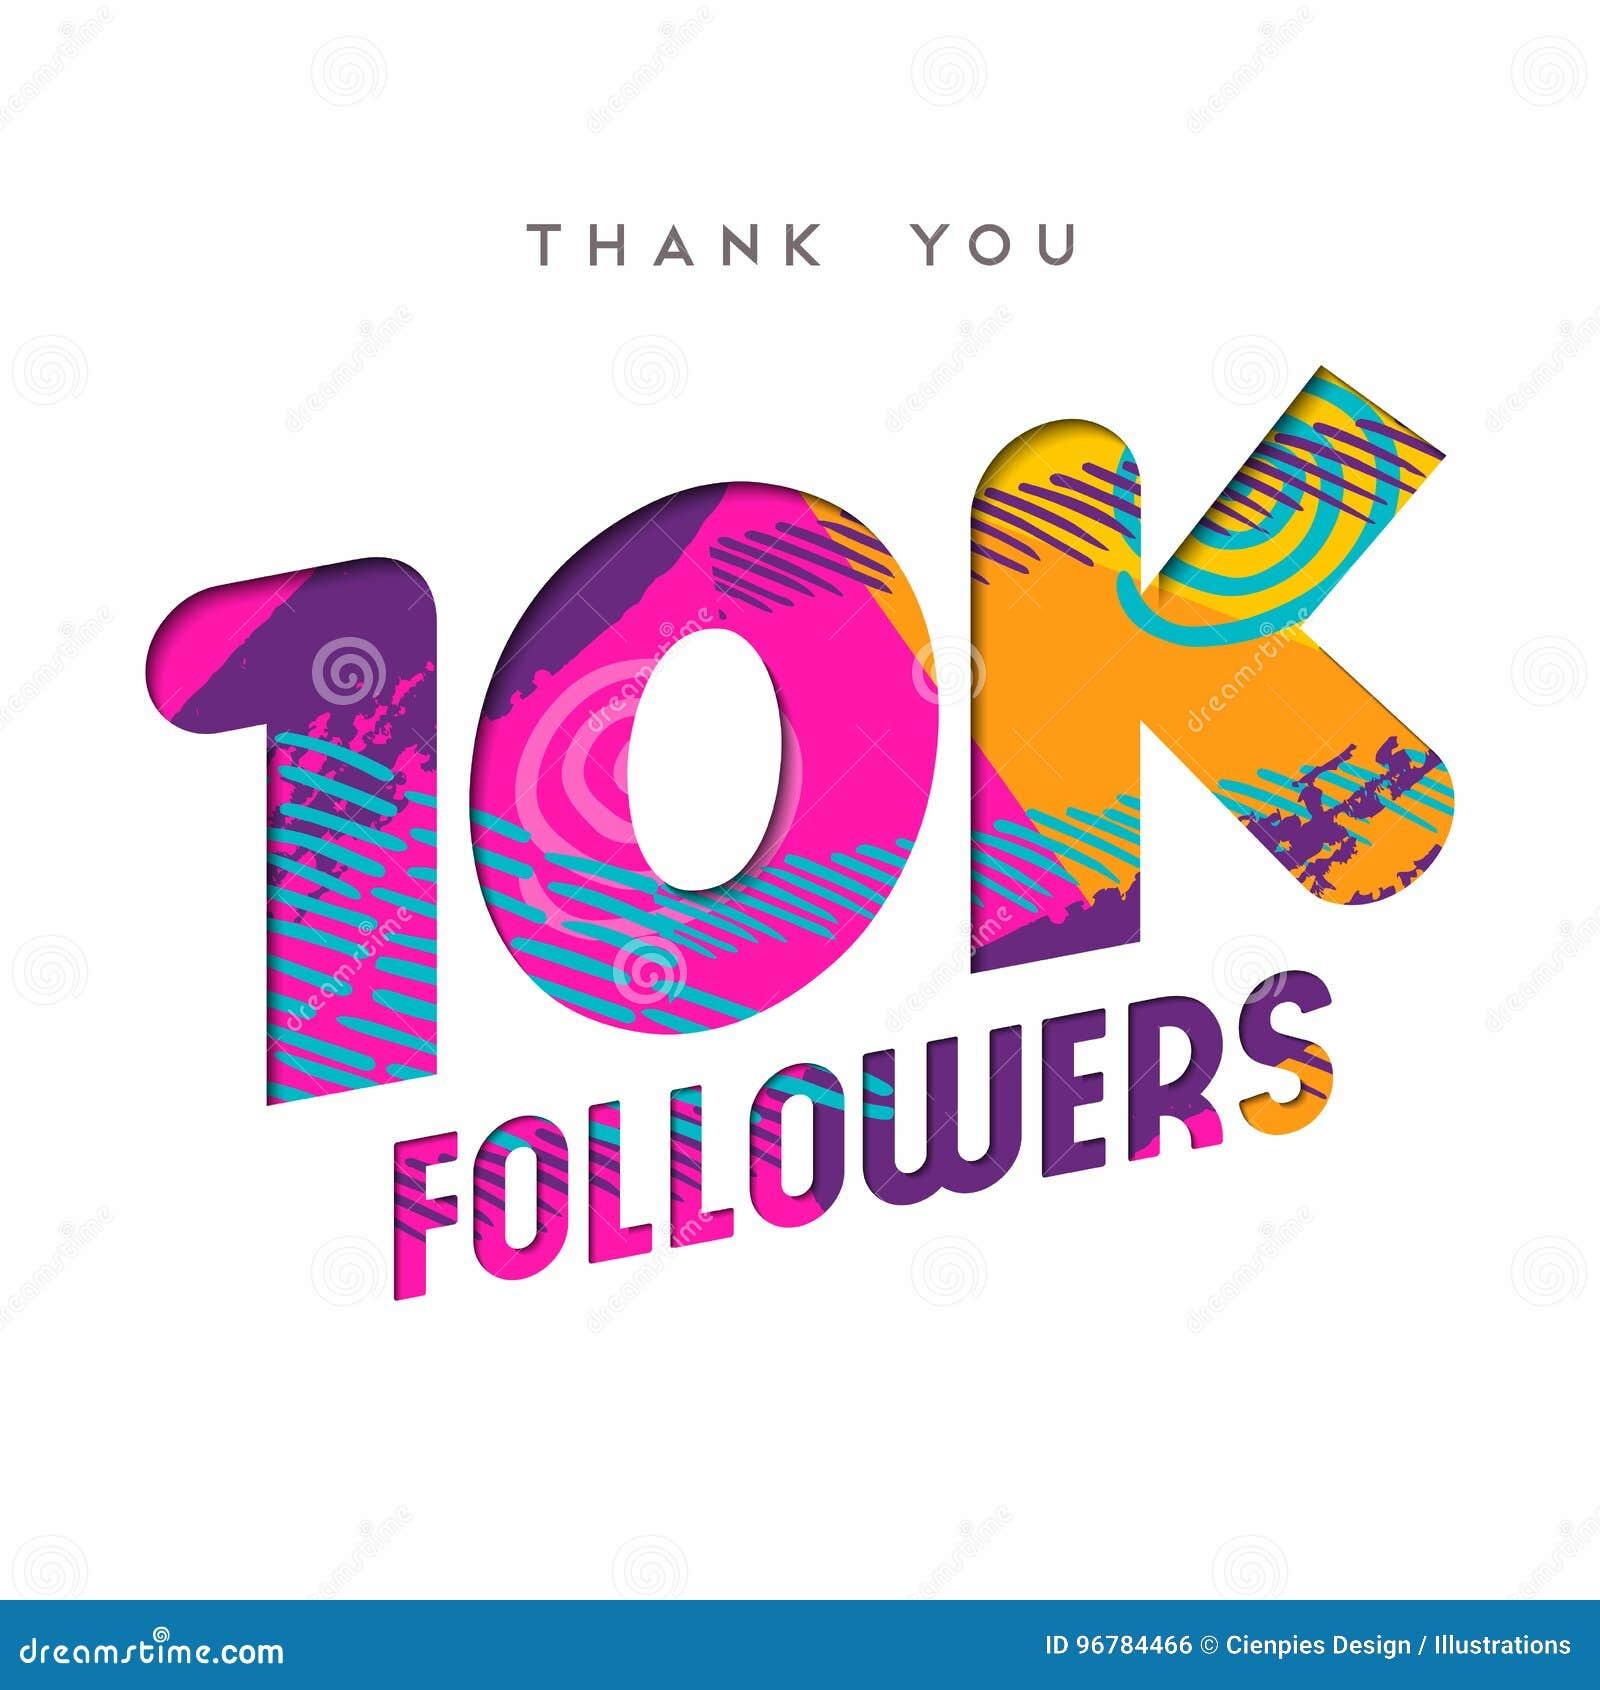 10k Photography 10kphotography: 10k Internet Follower Number Thank You Template Stock